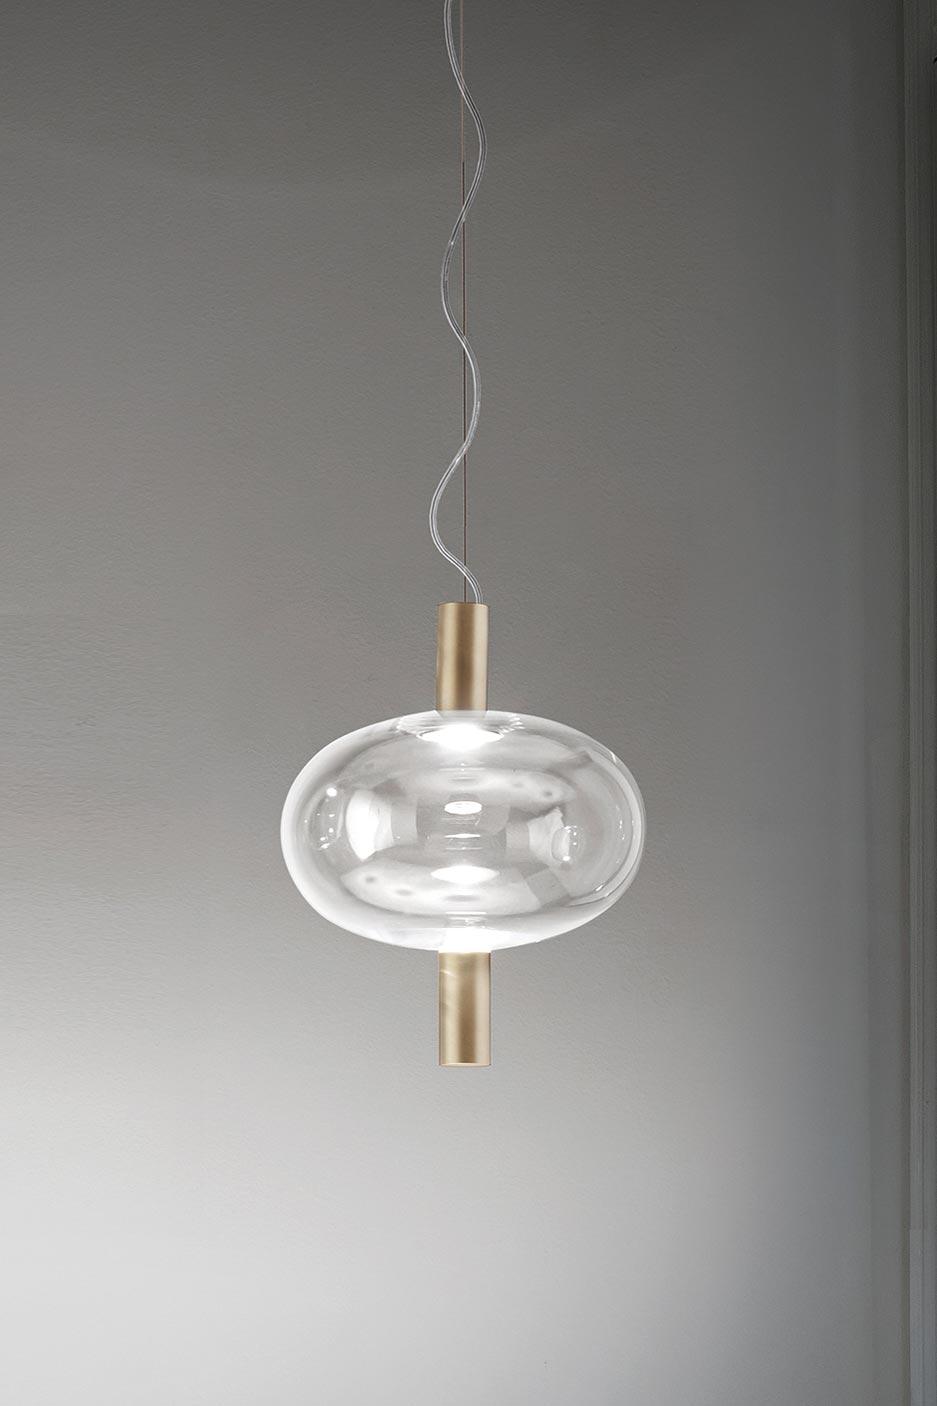 Reflex Contemporary Oval Pendant Lamp